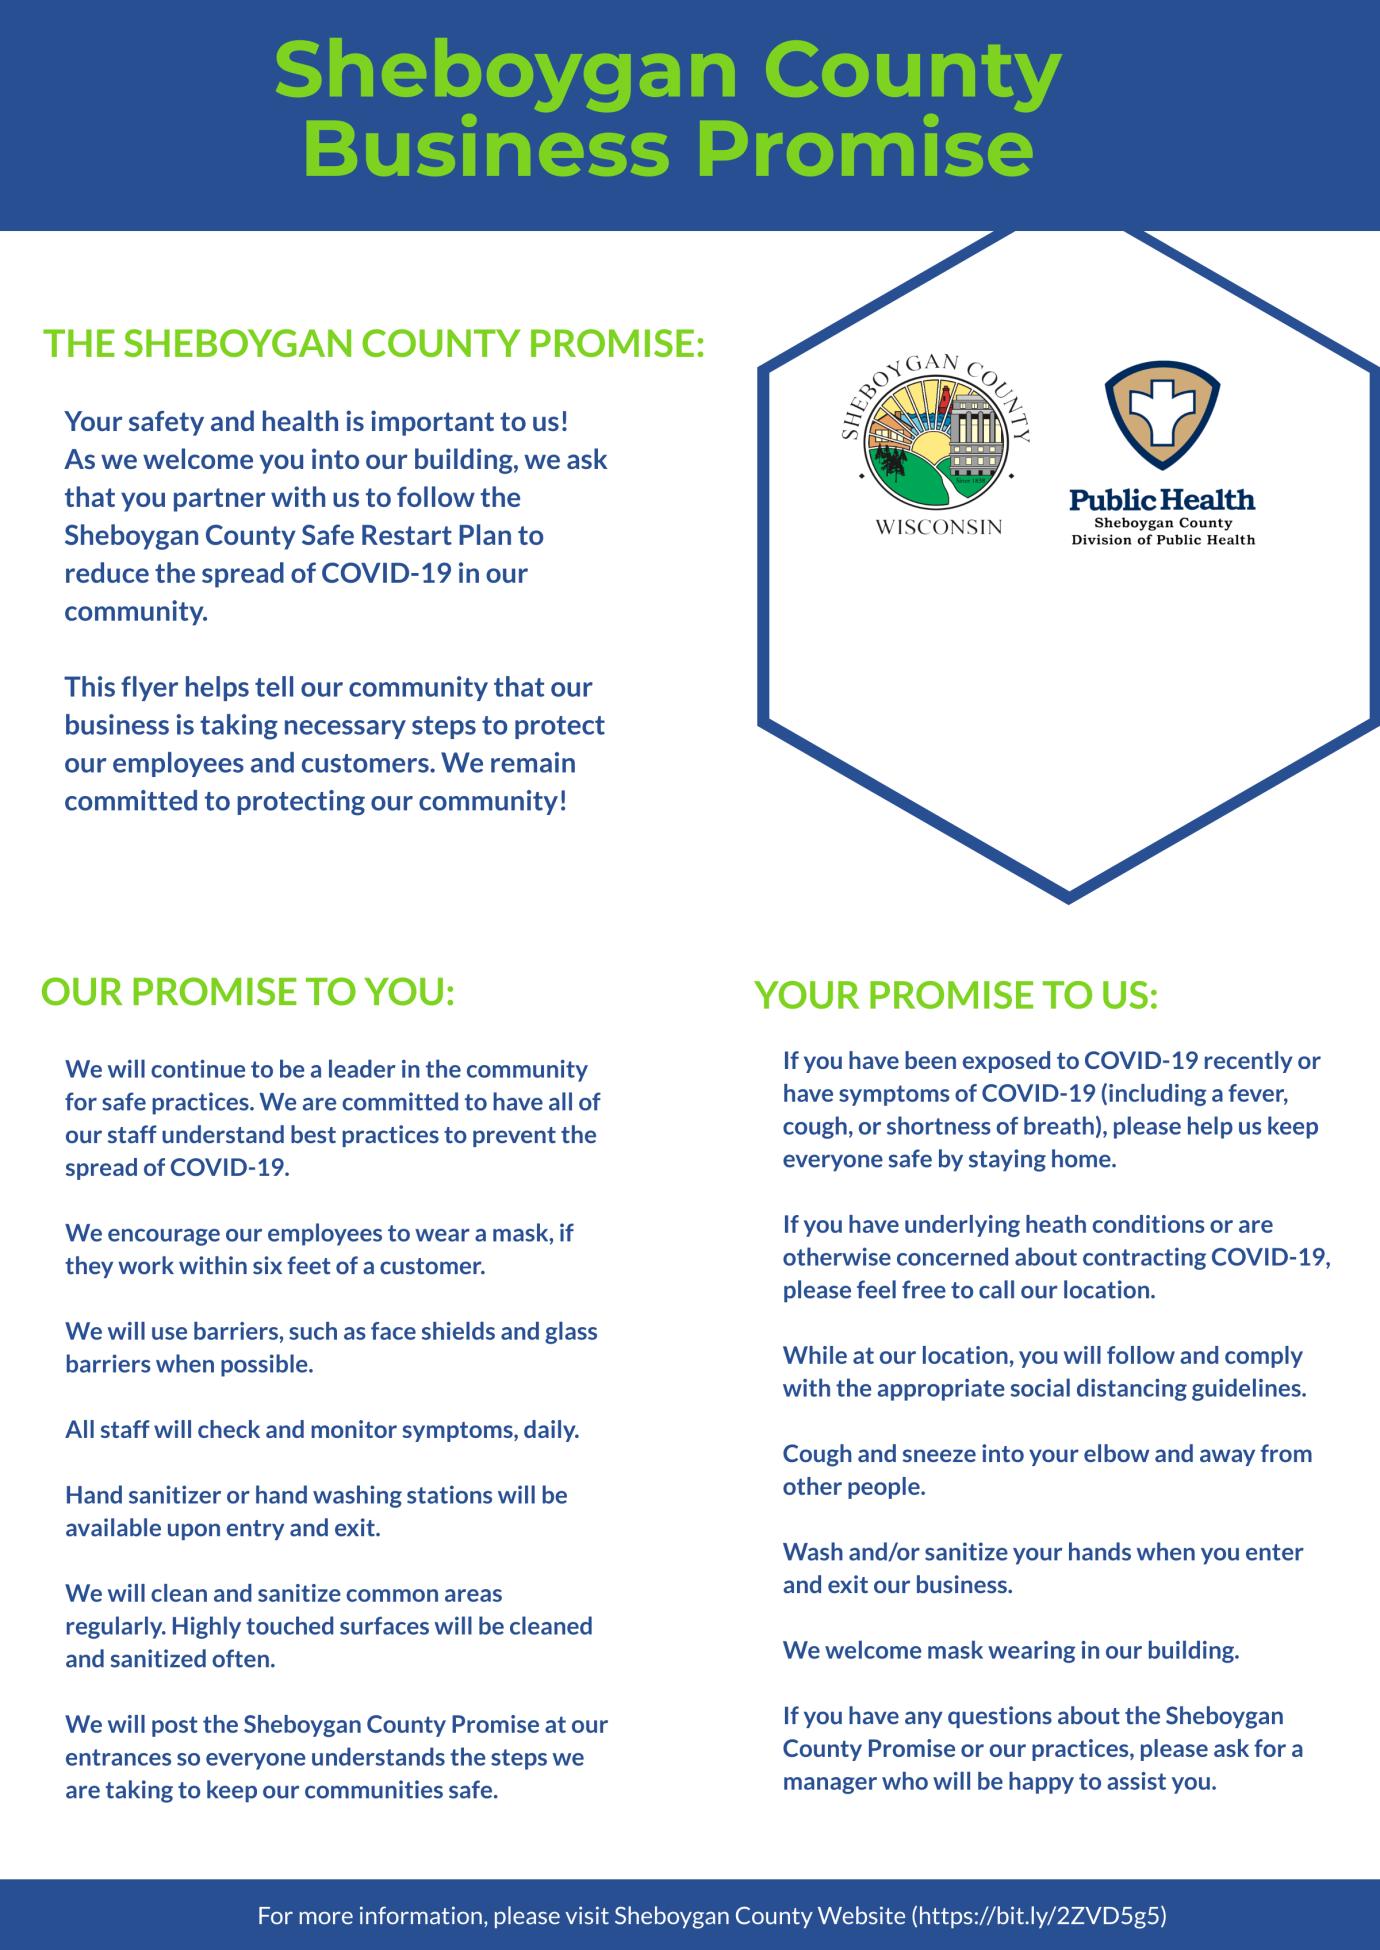 Sheboygan County Business Promise Sheboygan County